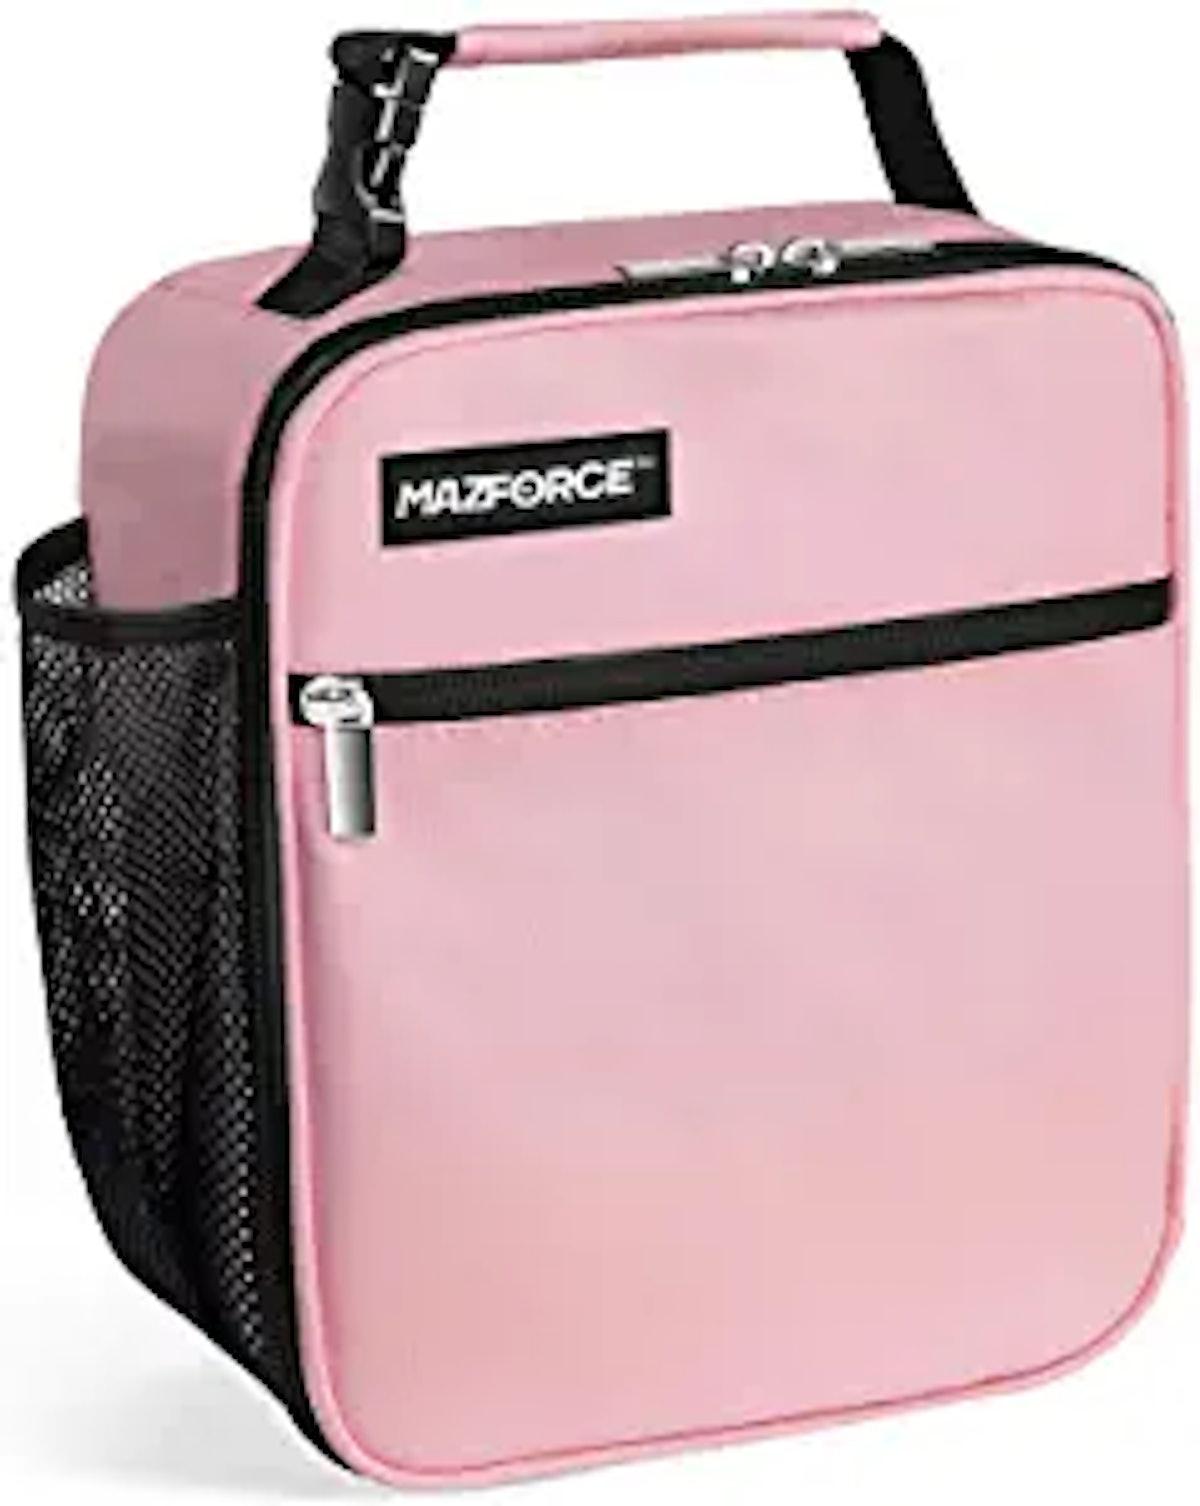 MAZFORCE Original Lunch Bag